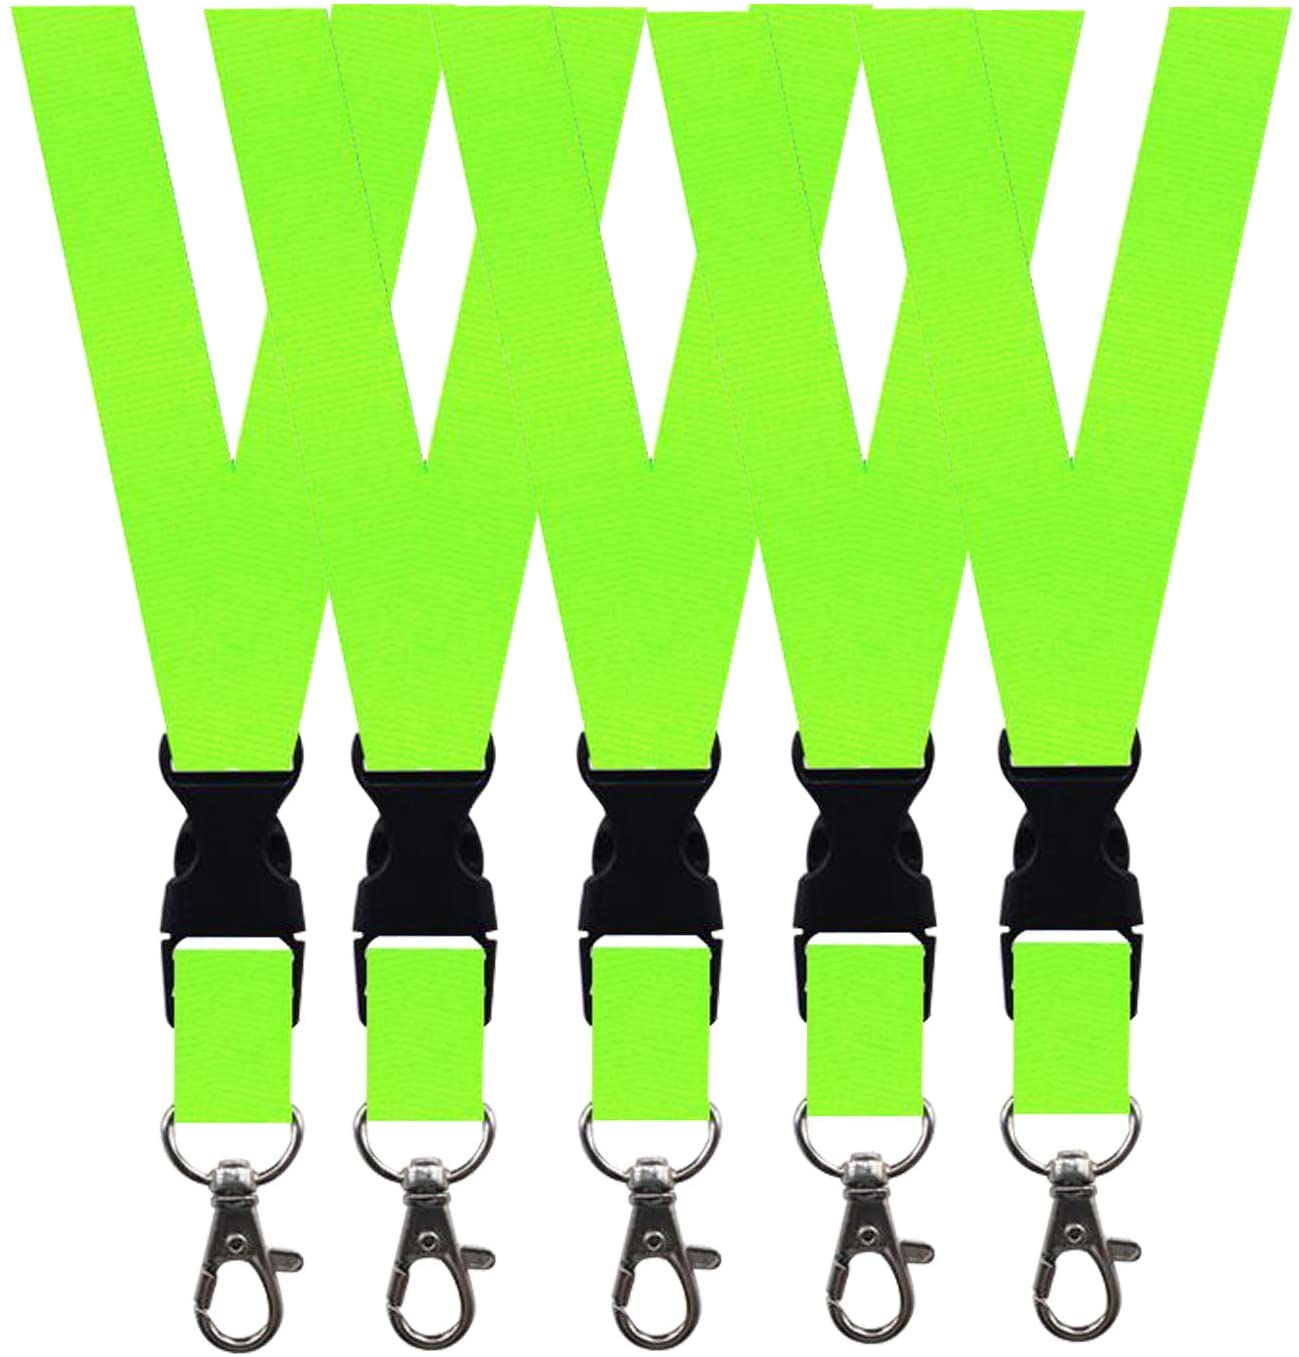 5 Pack Neck Safety Lanyards Detachable Buckle Enhanced Model Hook Breakaway Strap Quick Release Lanyard for ID Badge Holders,Key,Women Men Cell Phones USB Whistles - Green